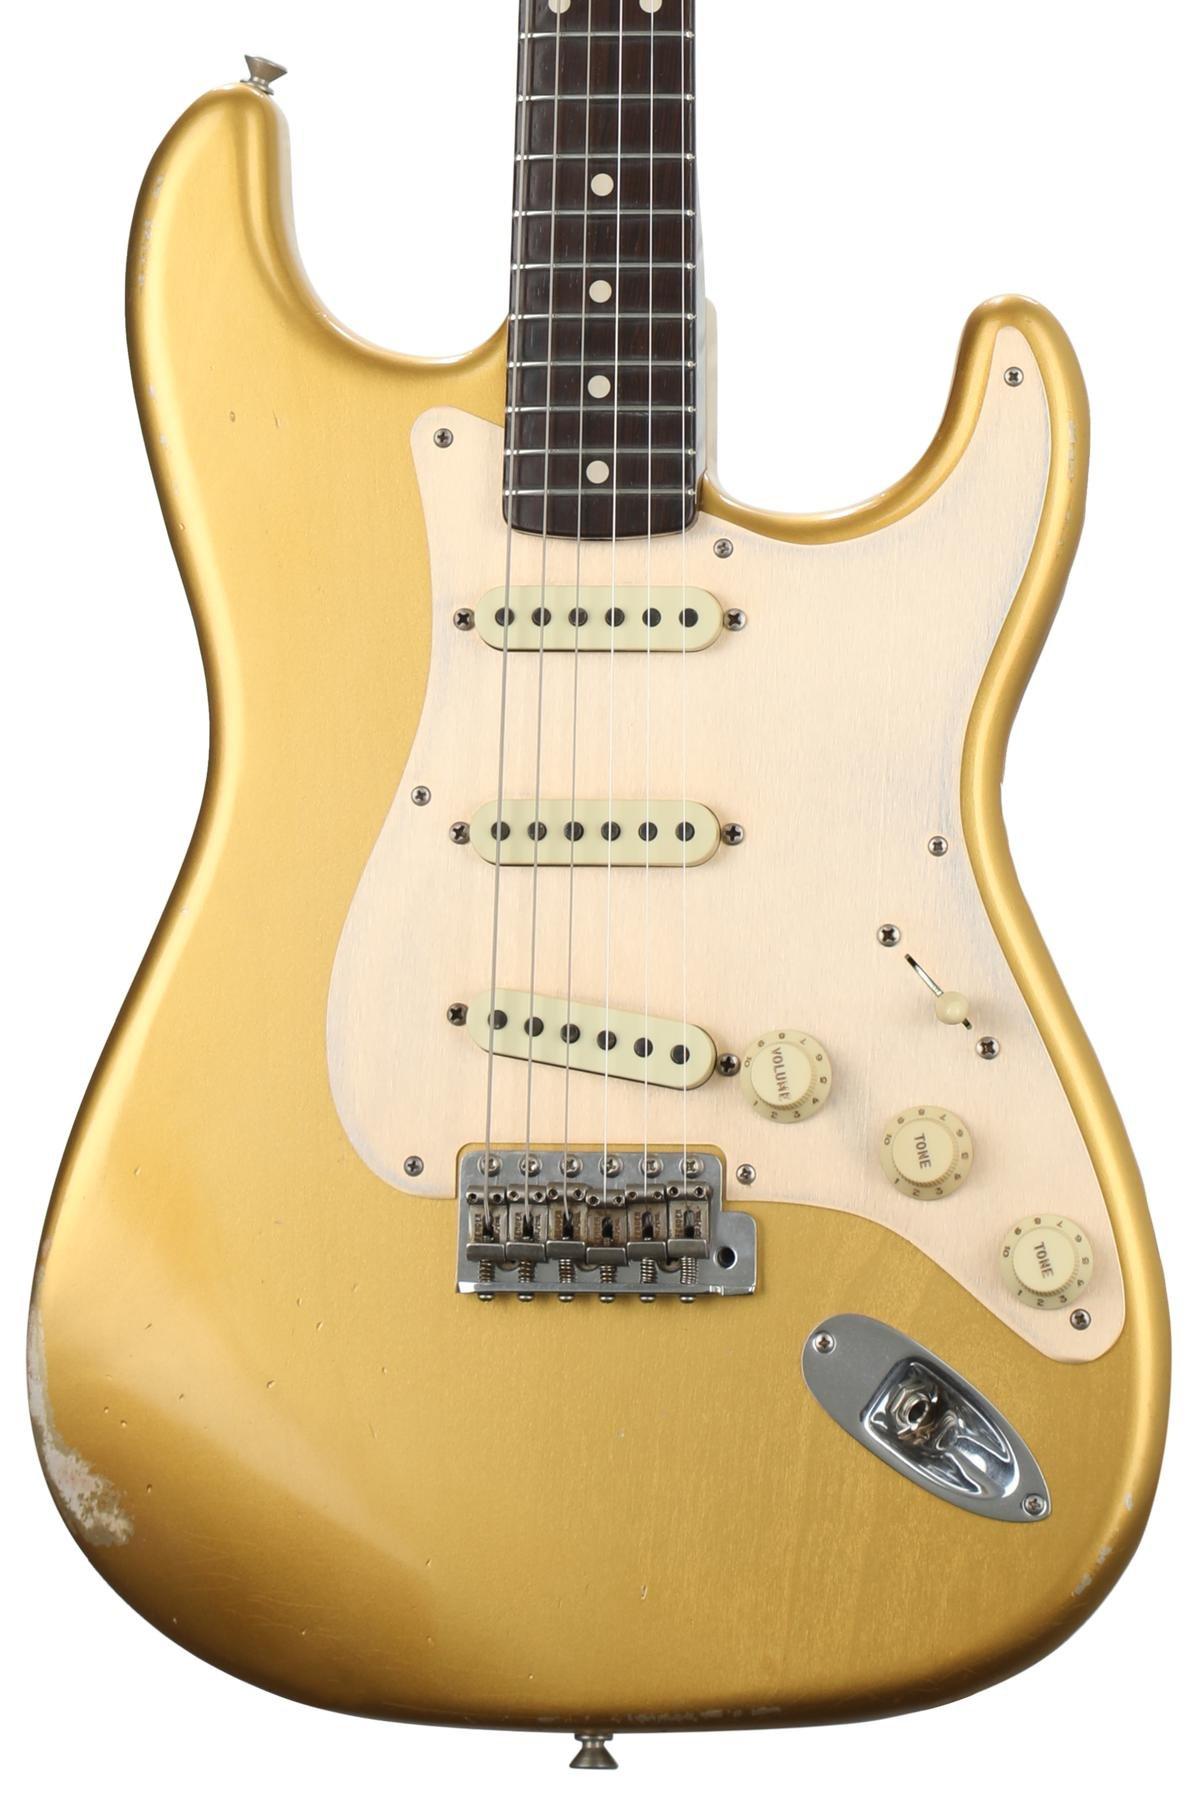 Fender Custom Shop Masterbuilt Dennis Galuszka Fat 50s Stratocaster Guitar Kit Builder Understanding The 5way Switch Aged Aztec Gold W Brazilian